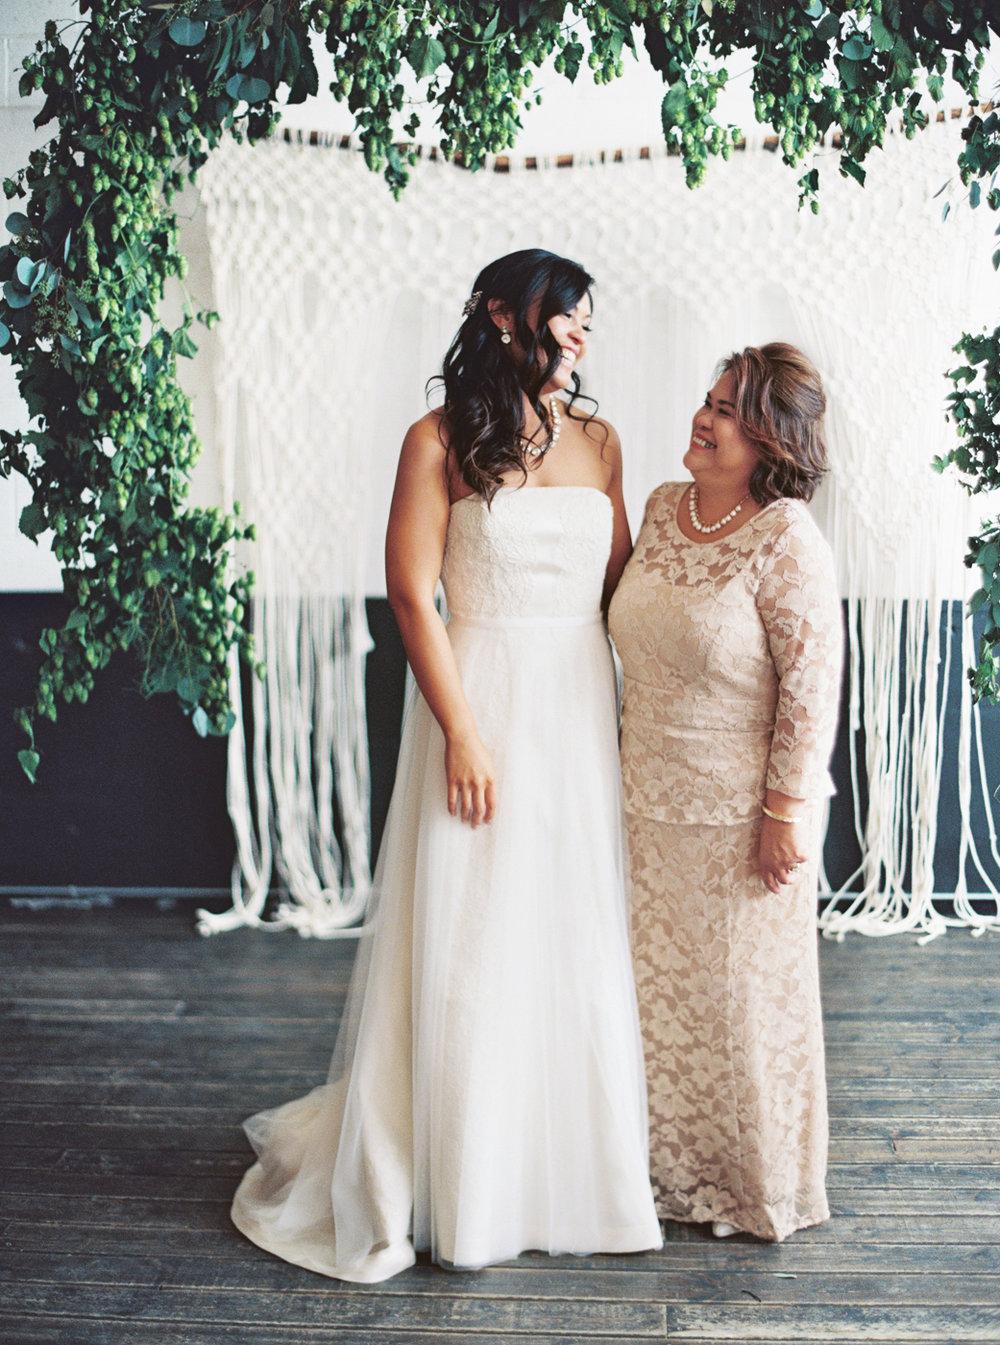 052Union_Pine_Portland_Oregon_Wedding_Photography.jpg